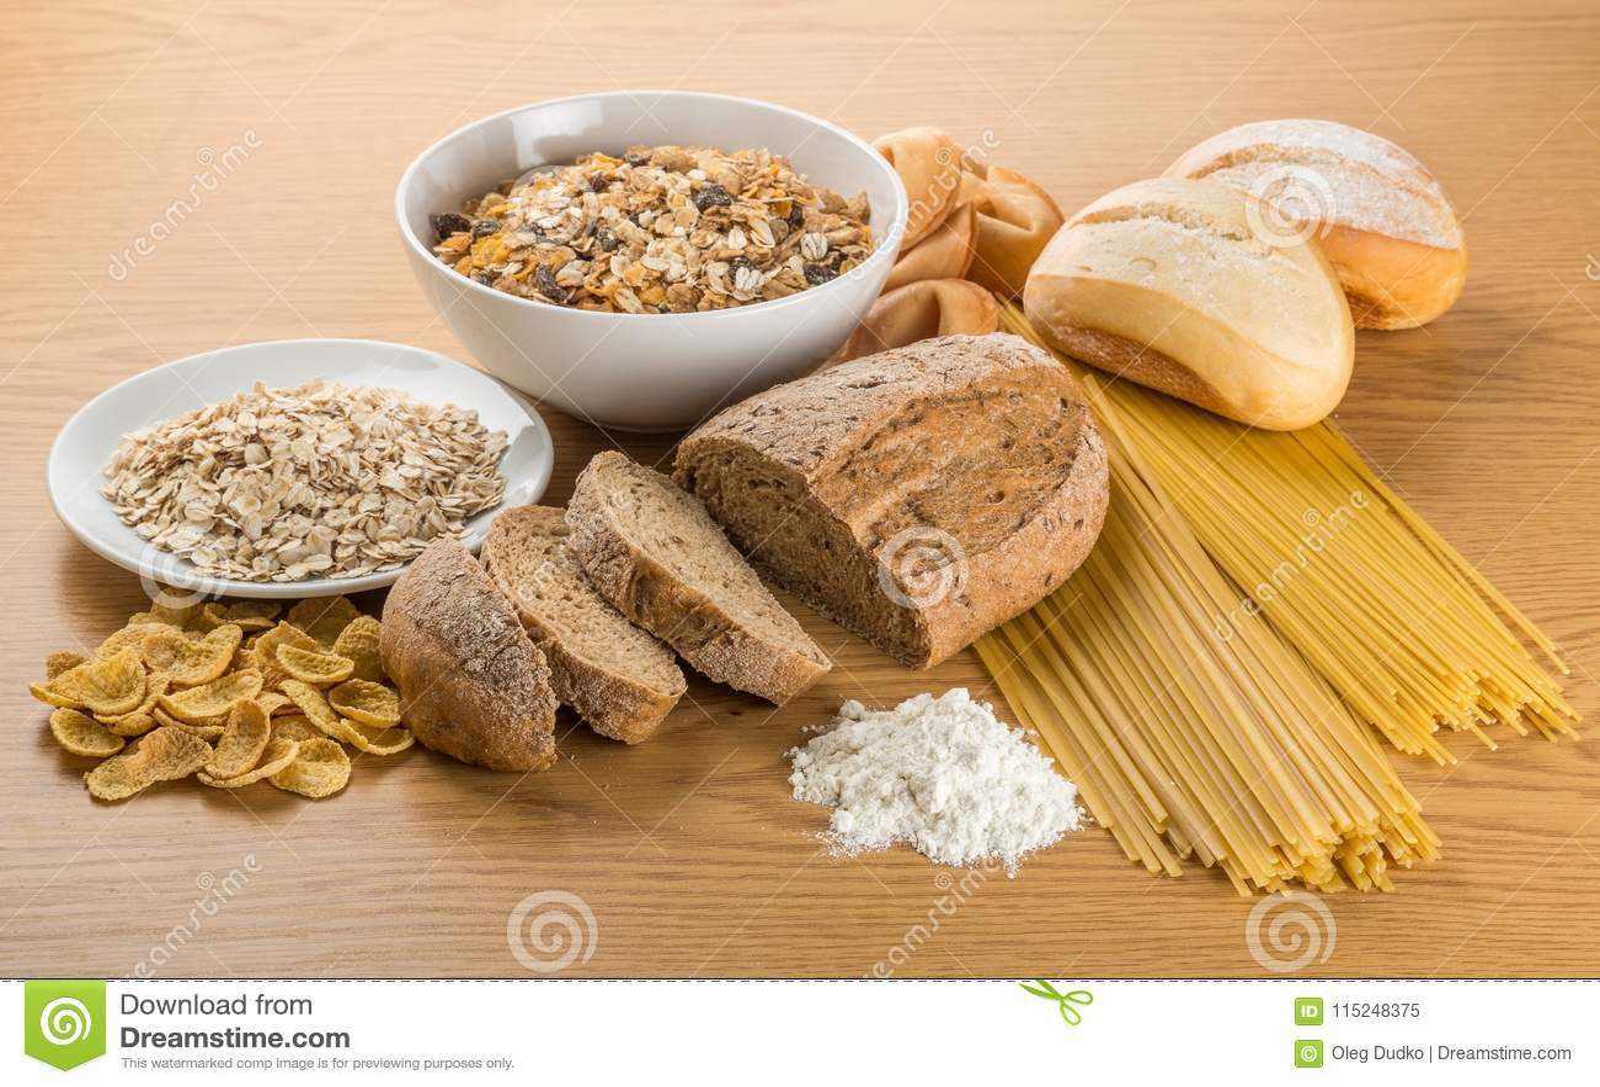 Grain Food Group Stock Image Image Of Oatmeal Board